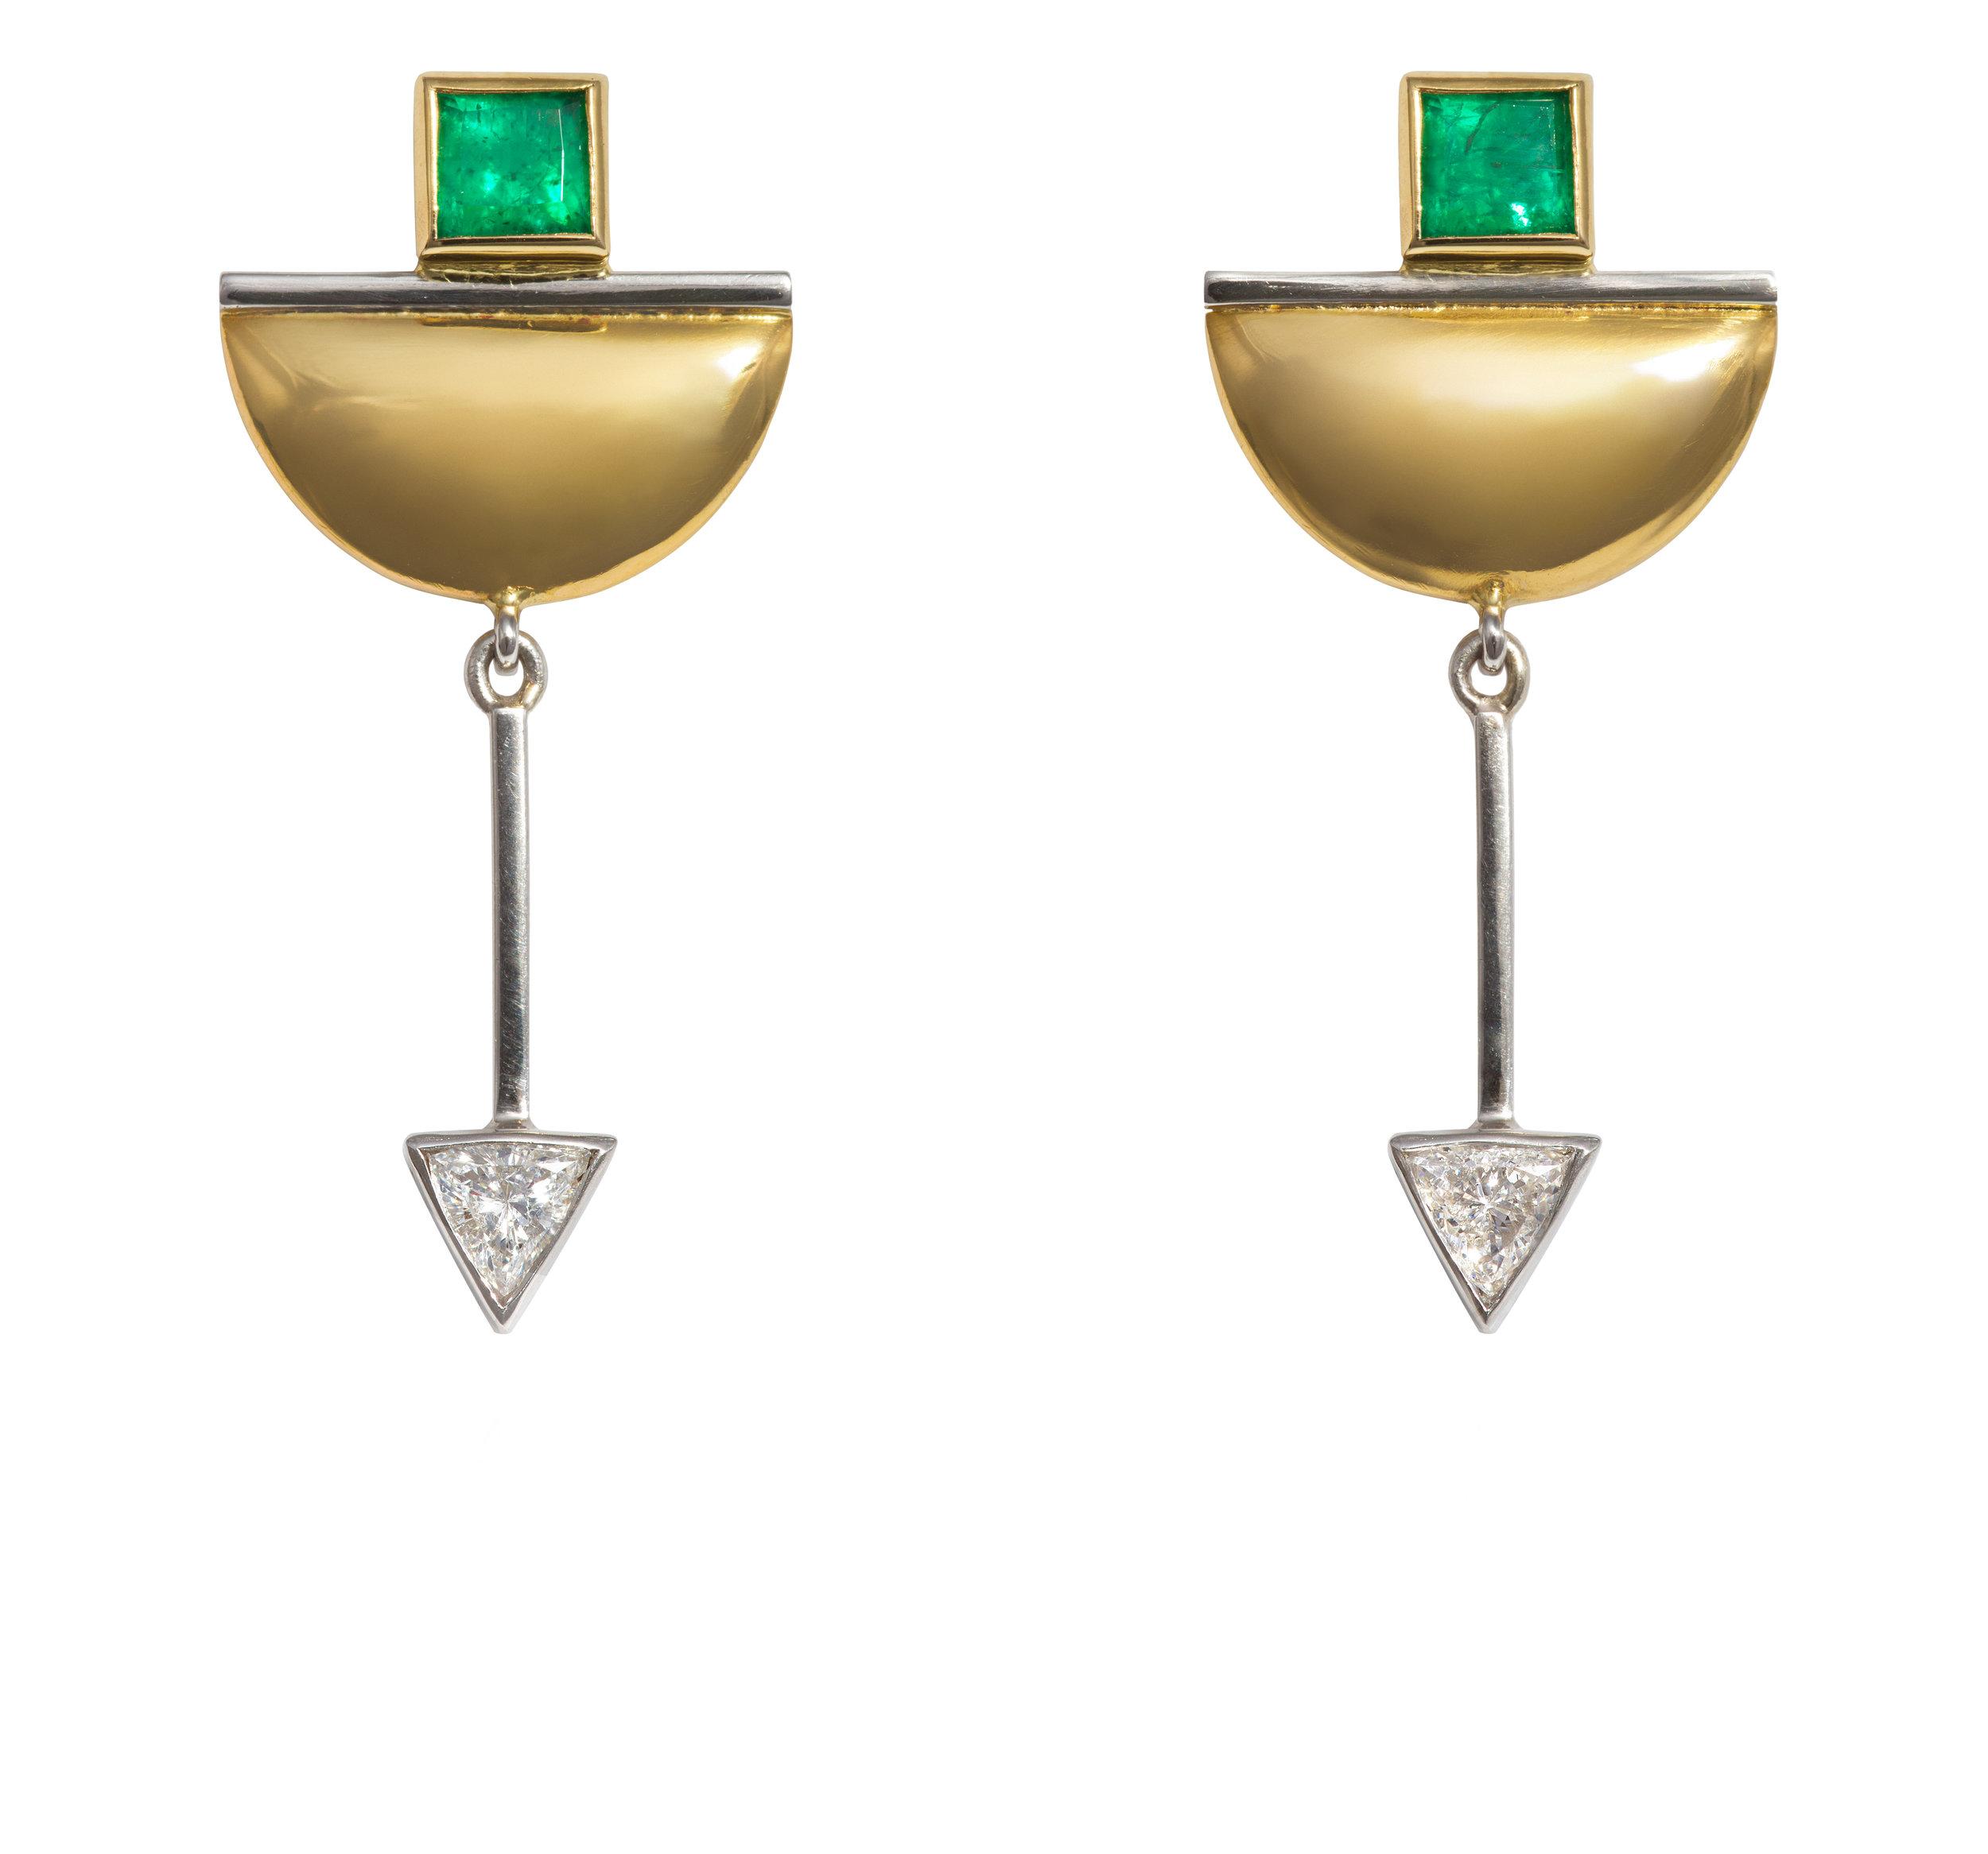 Bespoke emerald and diamond earring commission